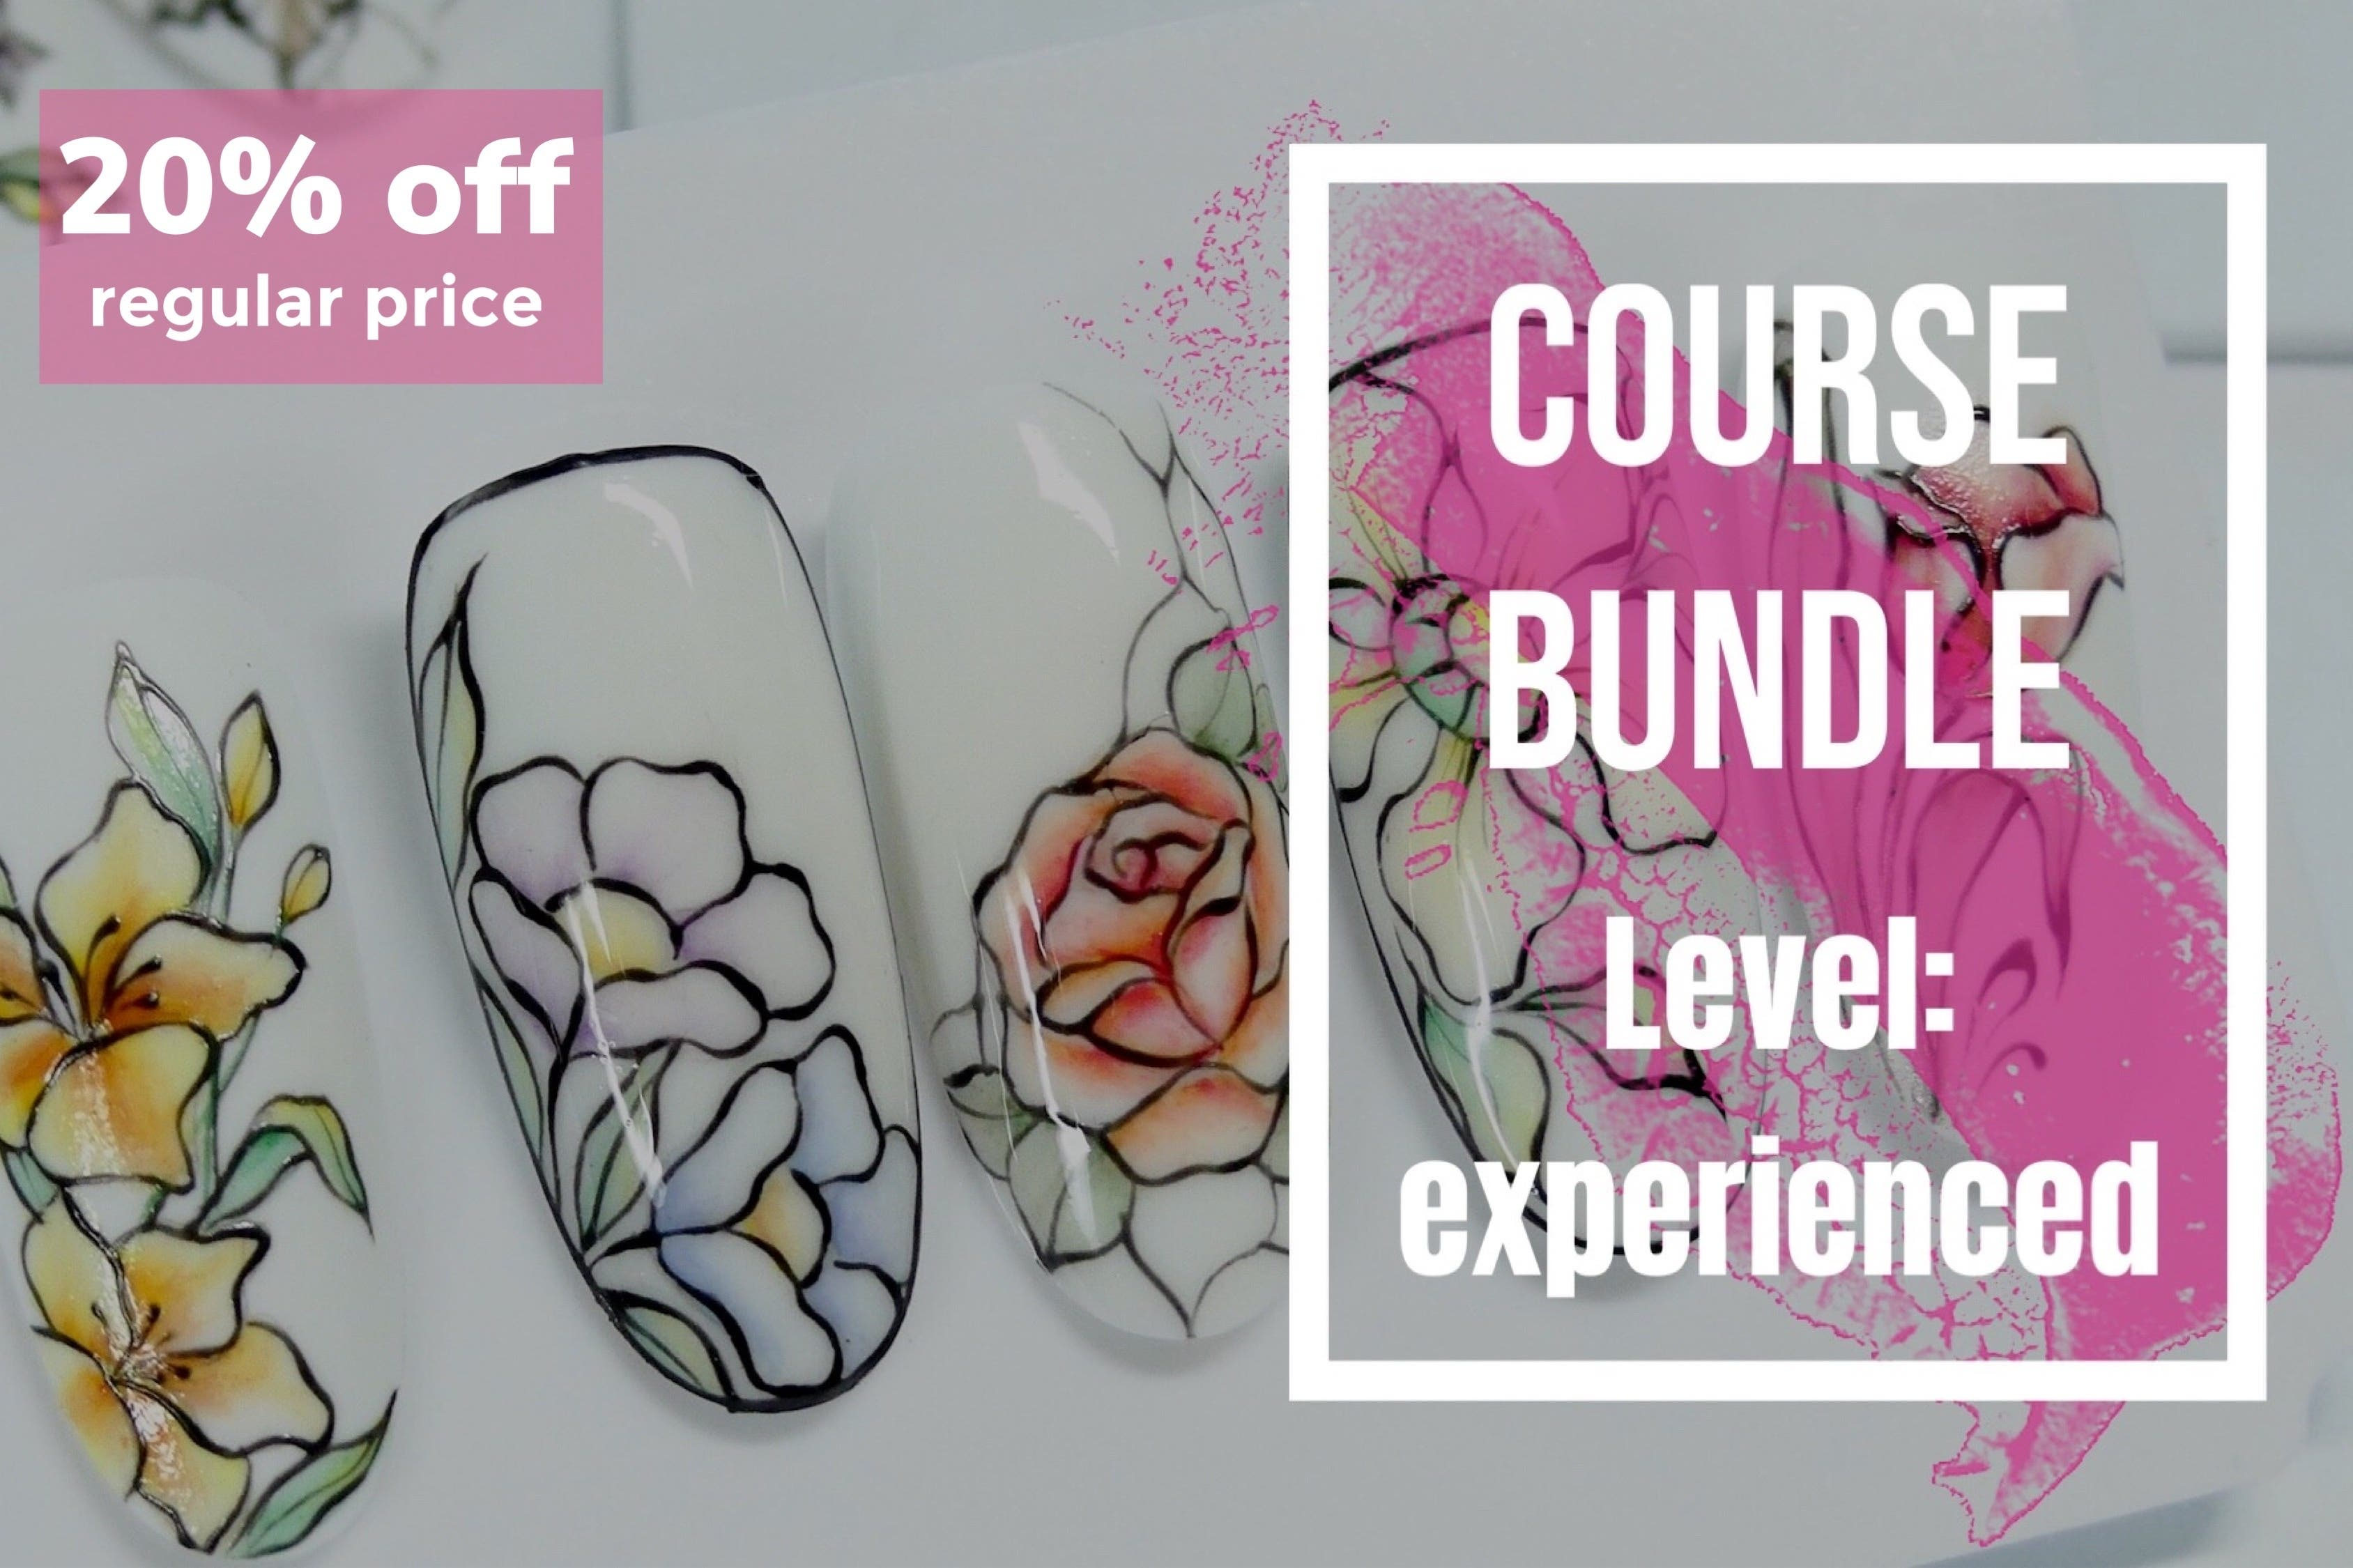 Course Bundle - Level Experienced